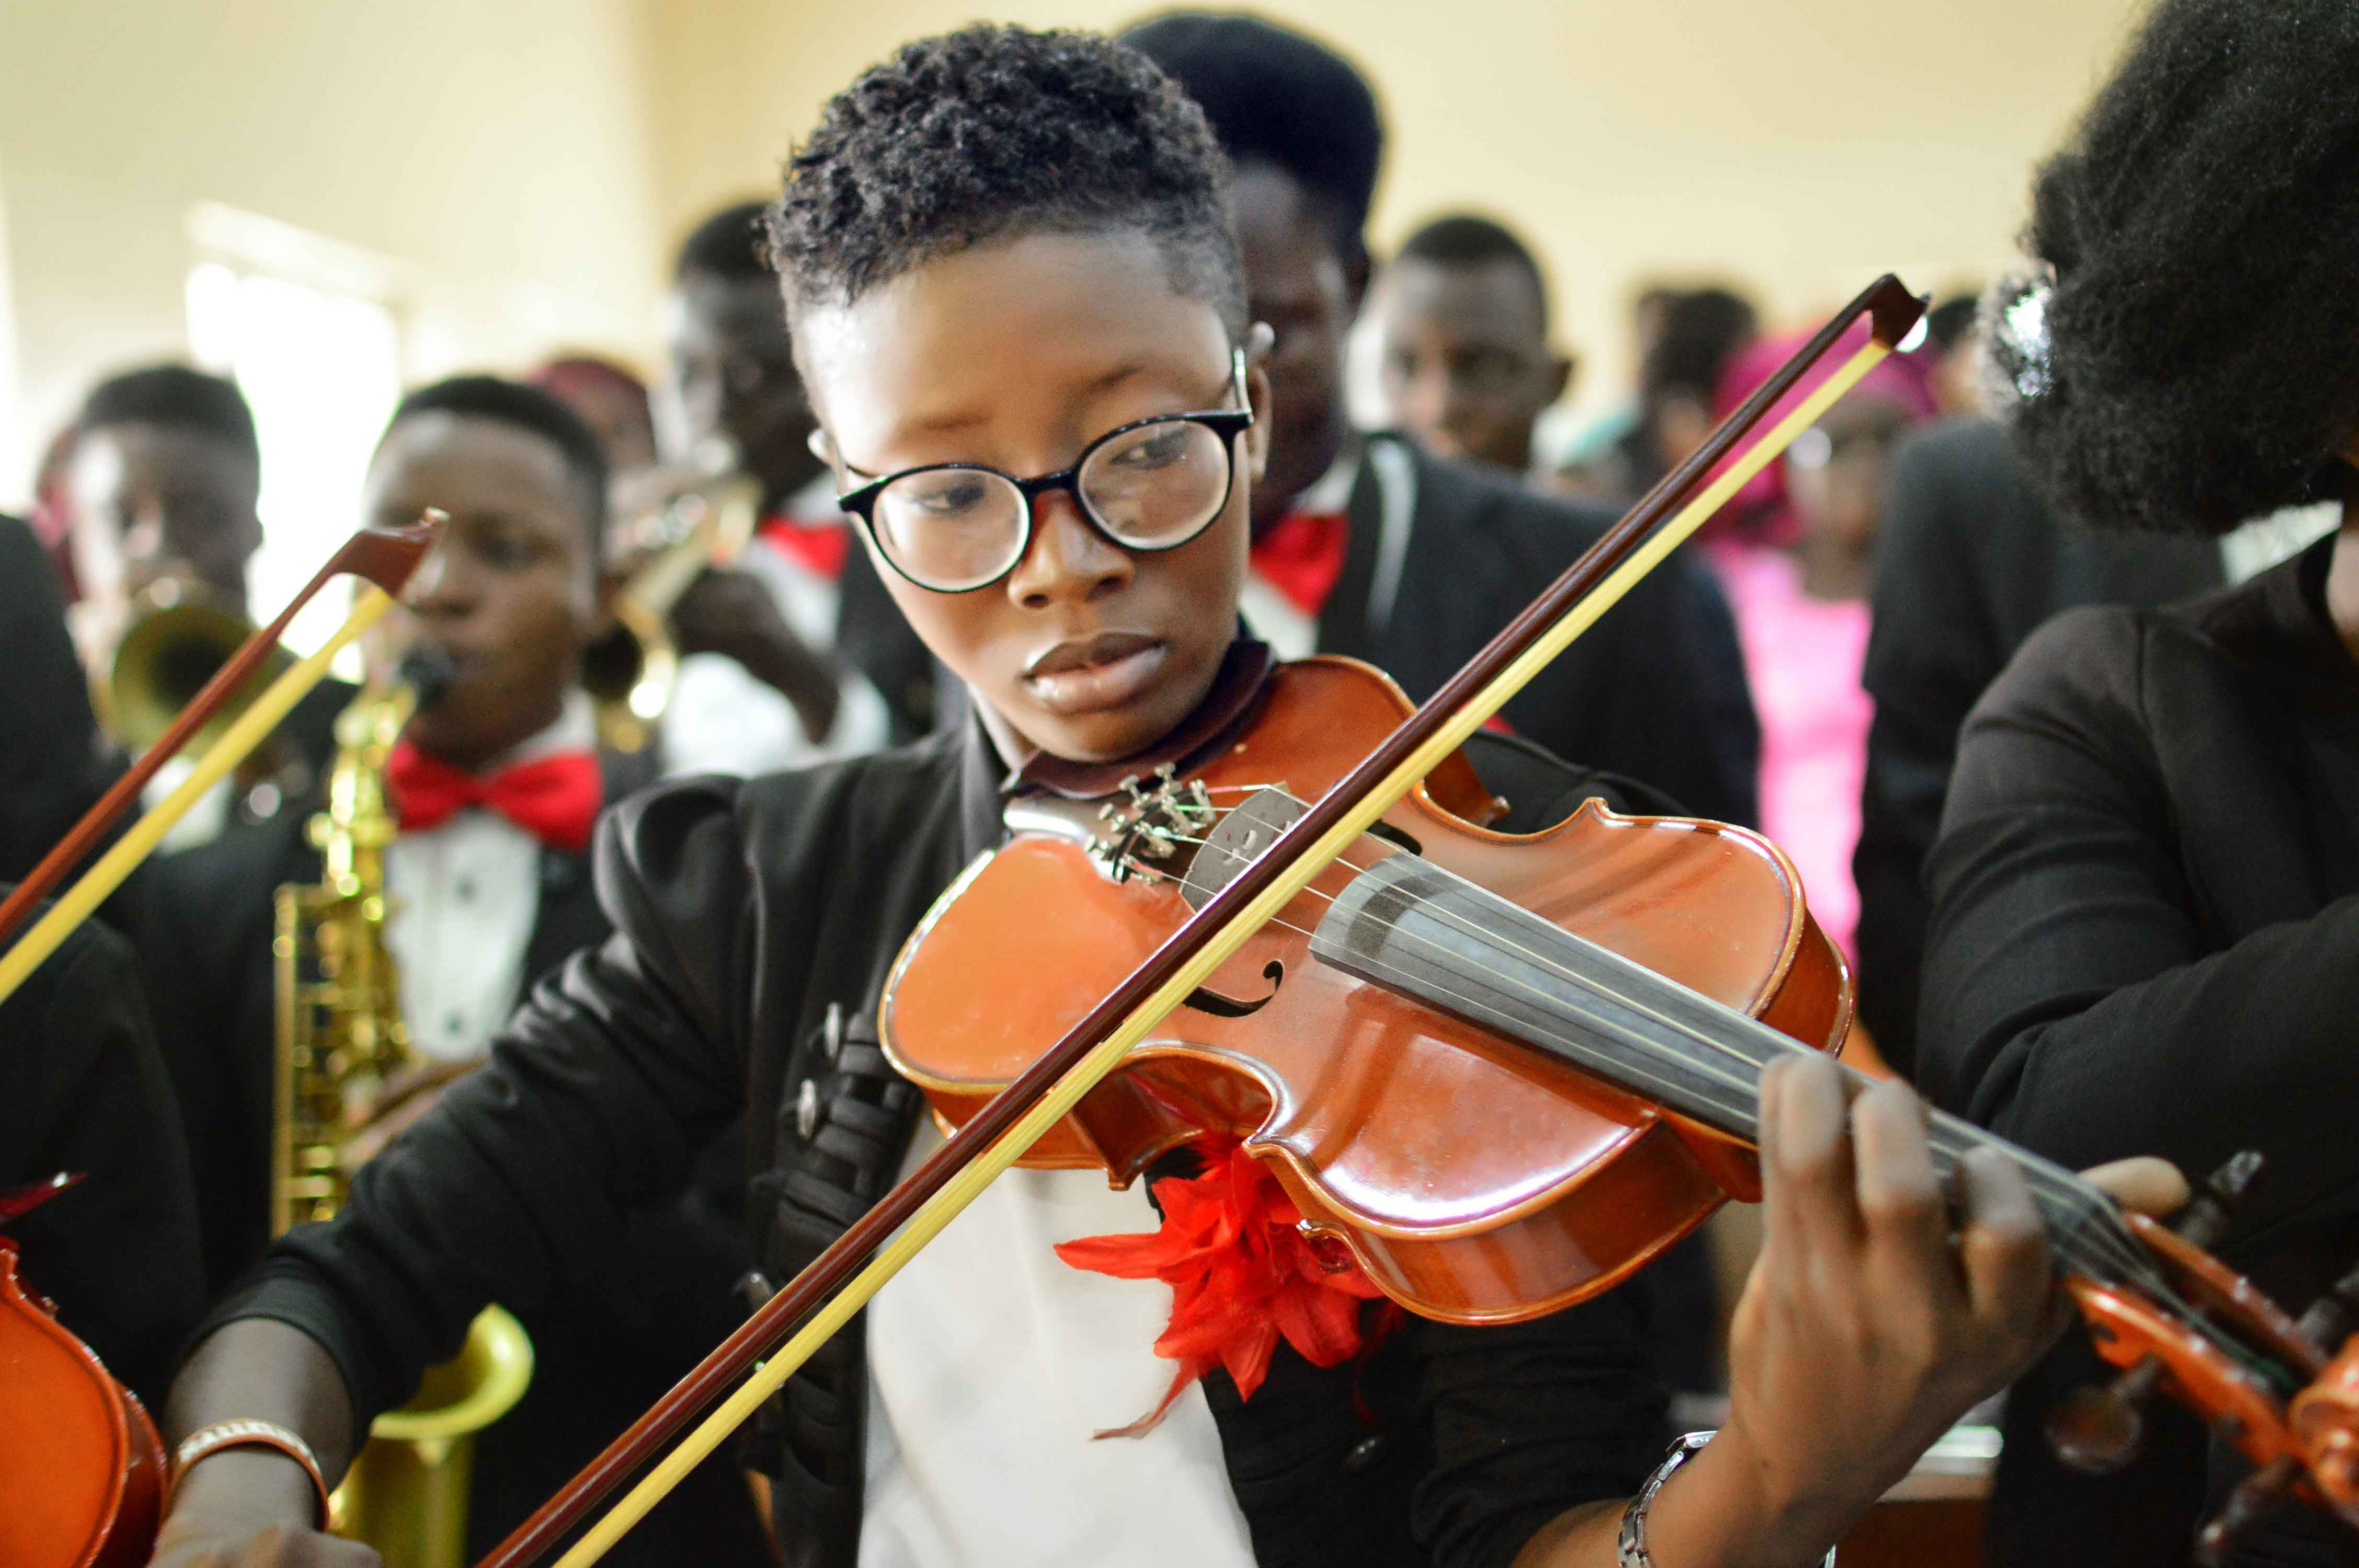 Bowens Violinist